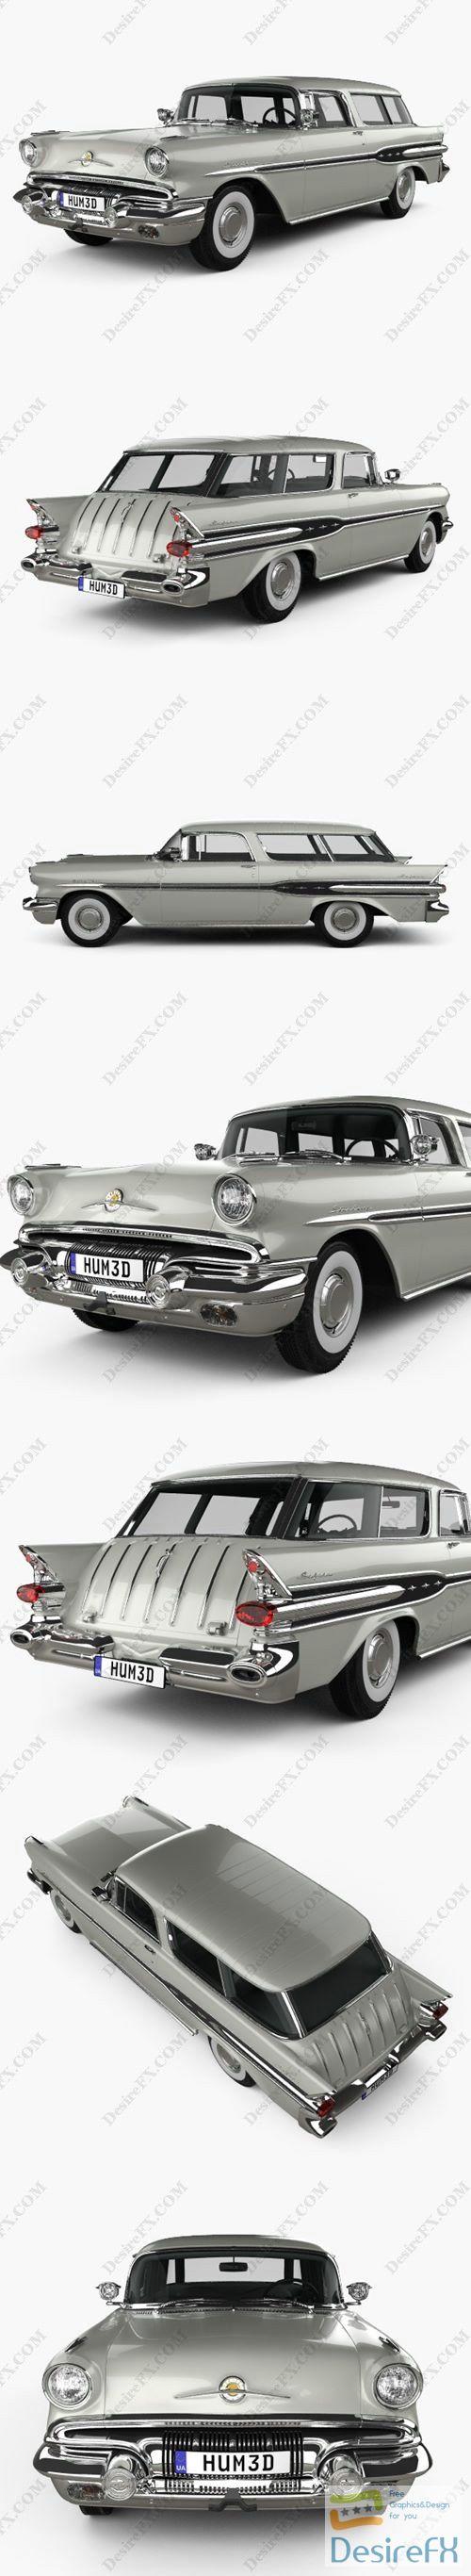 Pontiac Star Chief Custom Safari 2-door 1957 3D Model